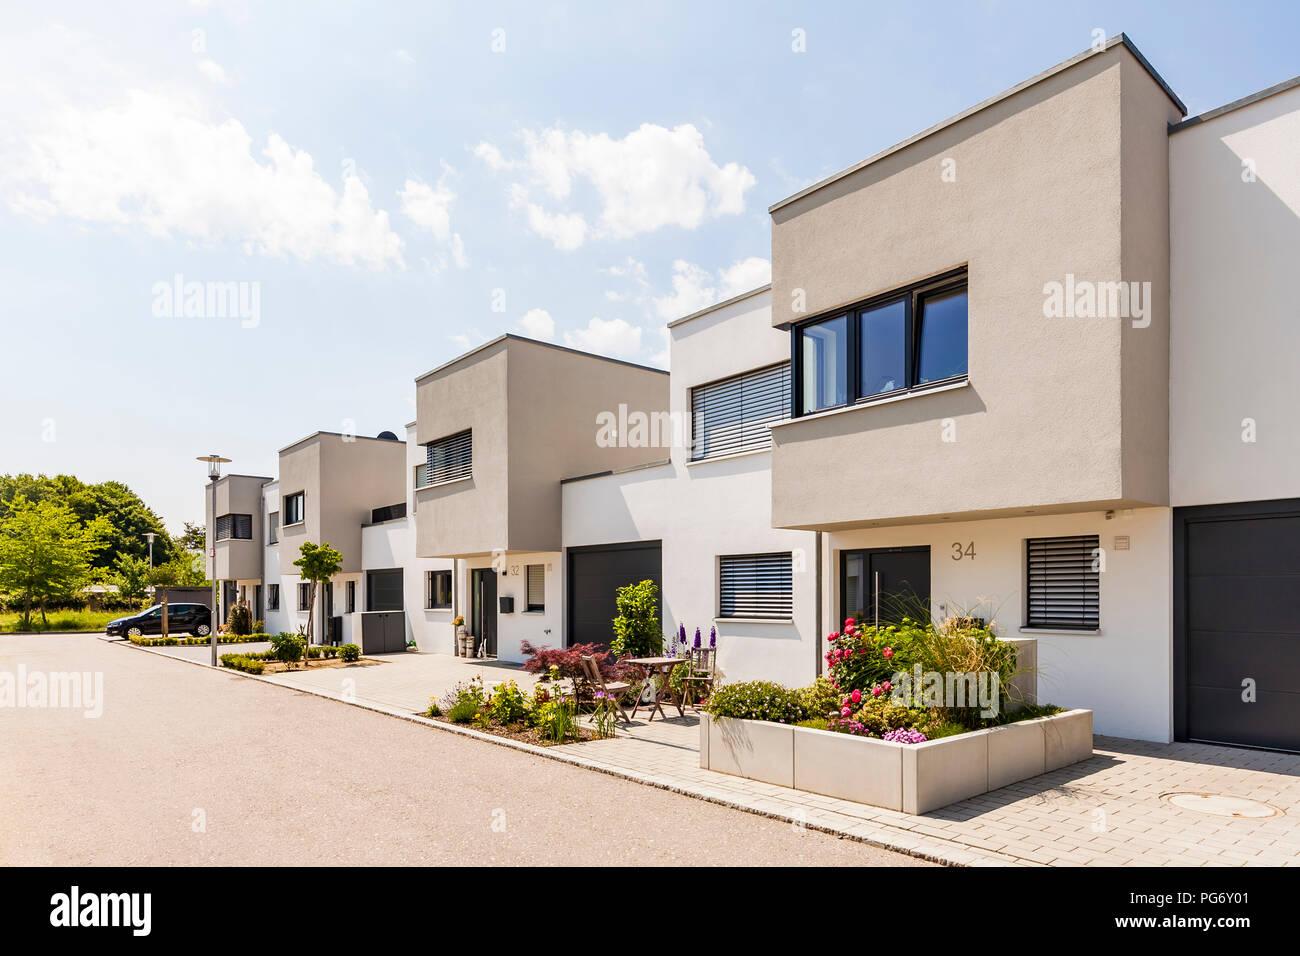 Alemania baviera neu ulm modernas casas unifamiliares for Diseno casas unifamiliares